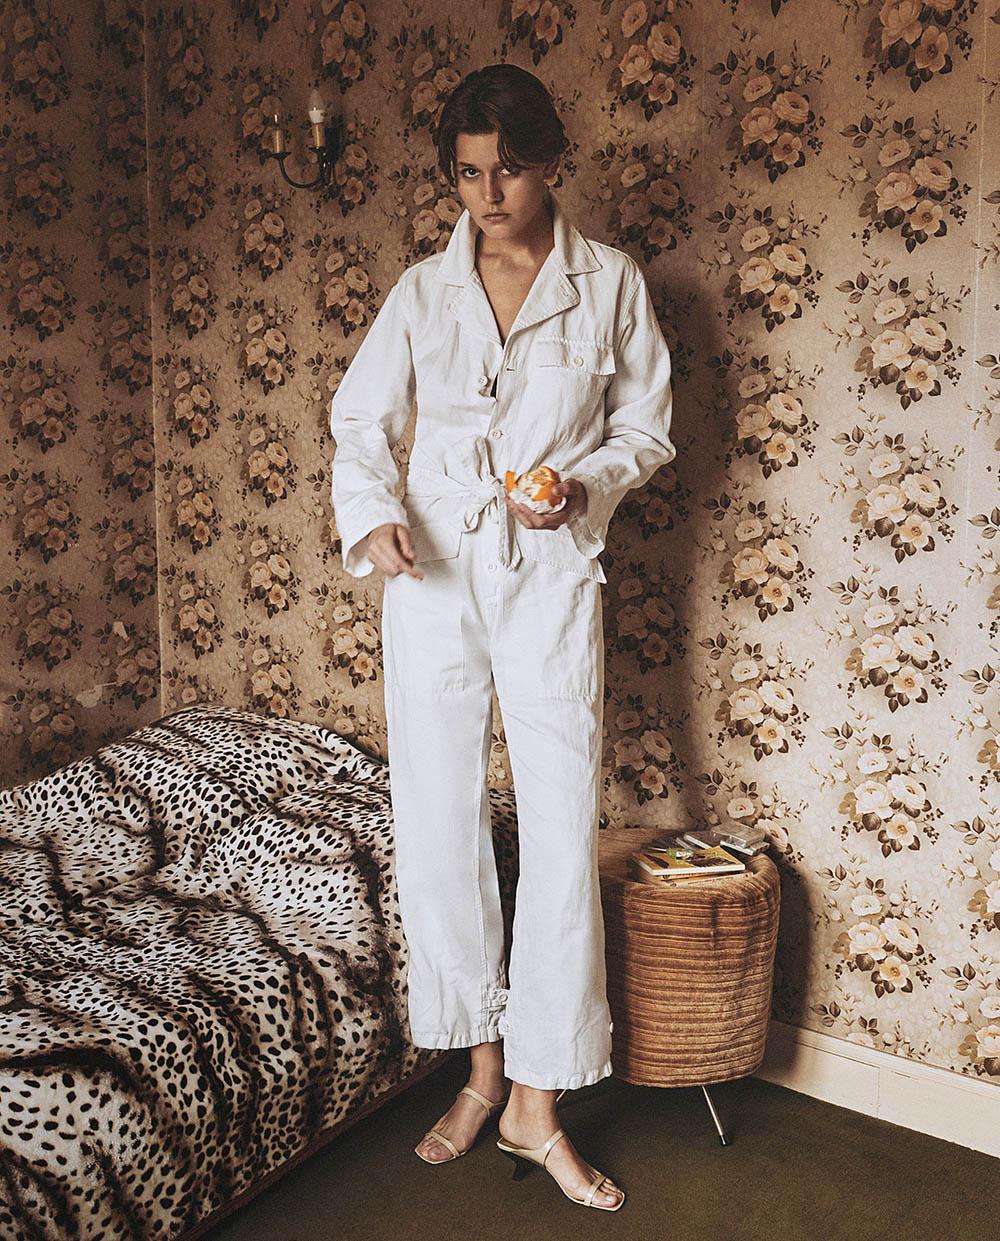 Vivienne Rohner by Van Mossevelde + N for Vogue Russia May 2020